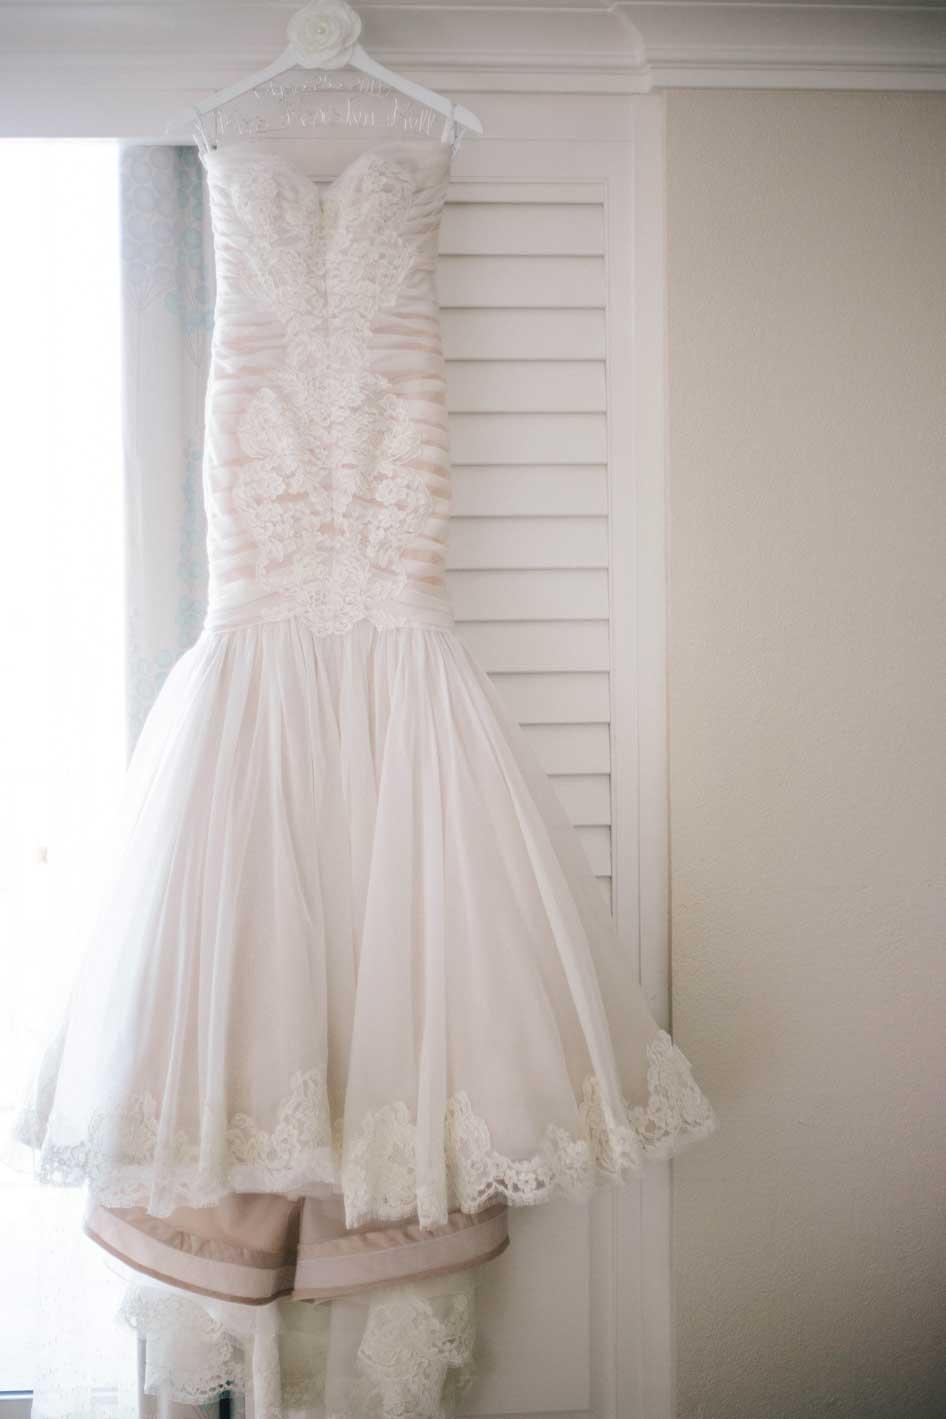 Kristen-Wedding-Dress-Hanging-Web-Sized.jpg